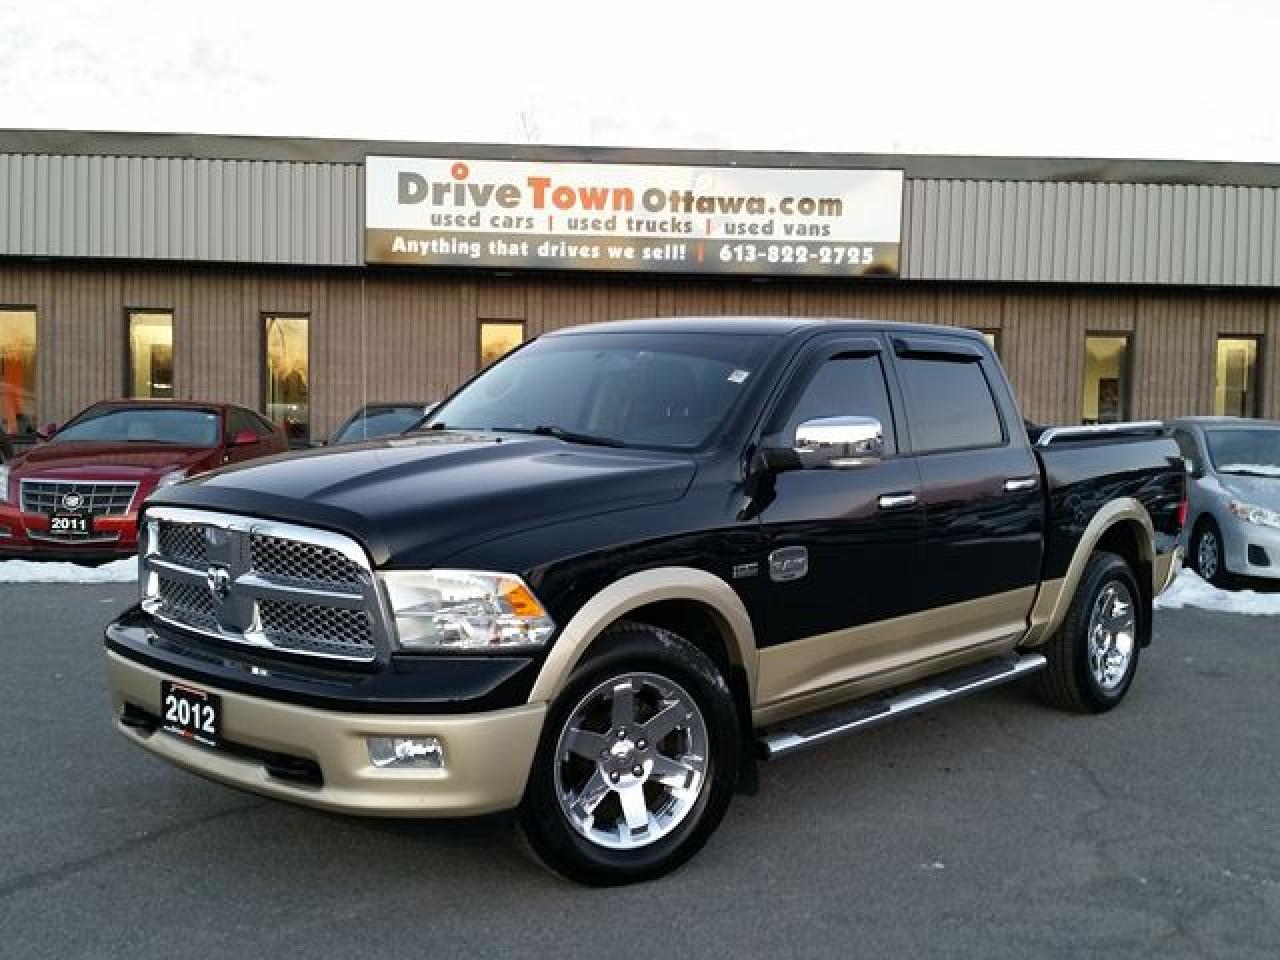 2012 RAM 1500 LARAMIE LONGHORN CREW 4X4 **NAV/MOONROOF/LEATHER**